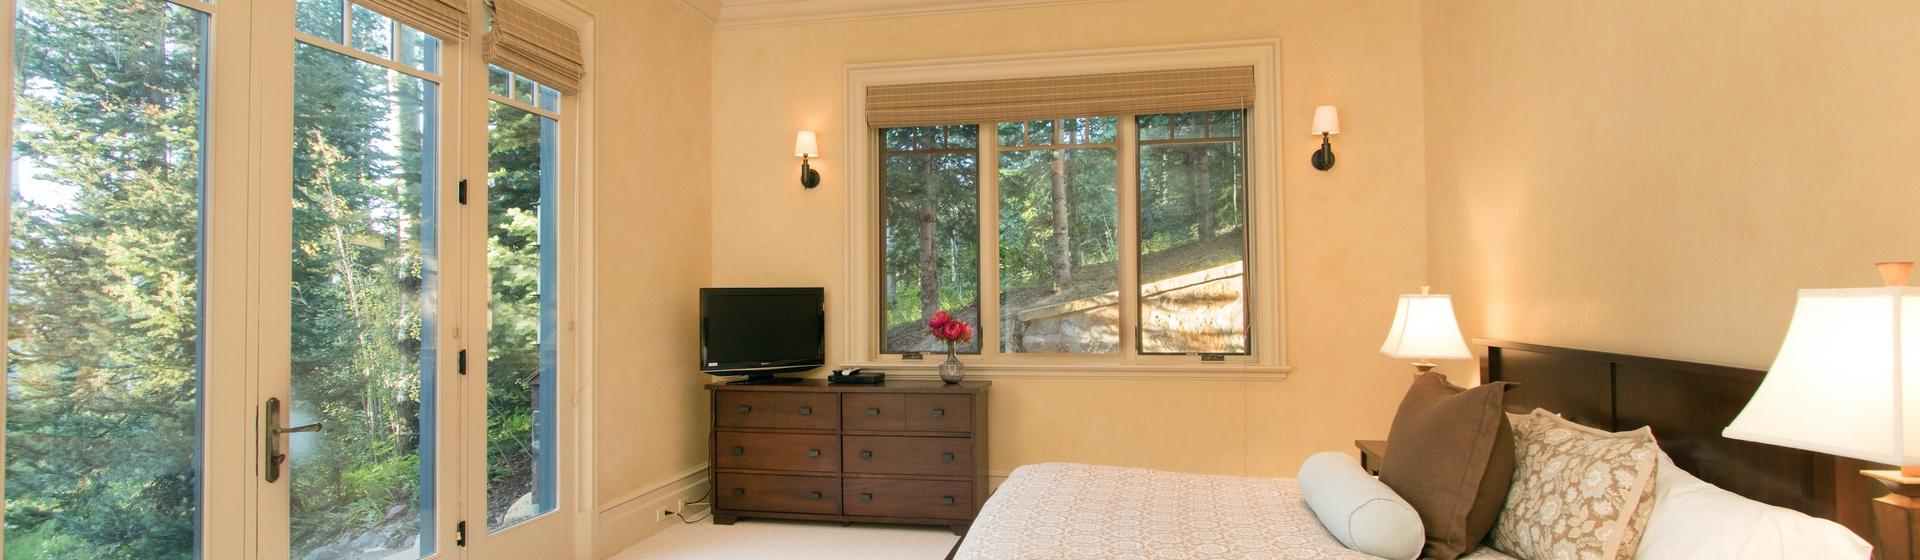 5.13-mountain-village-hood-park-manor-guest-bedroom-d-track.JPG